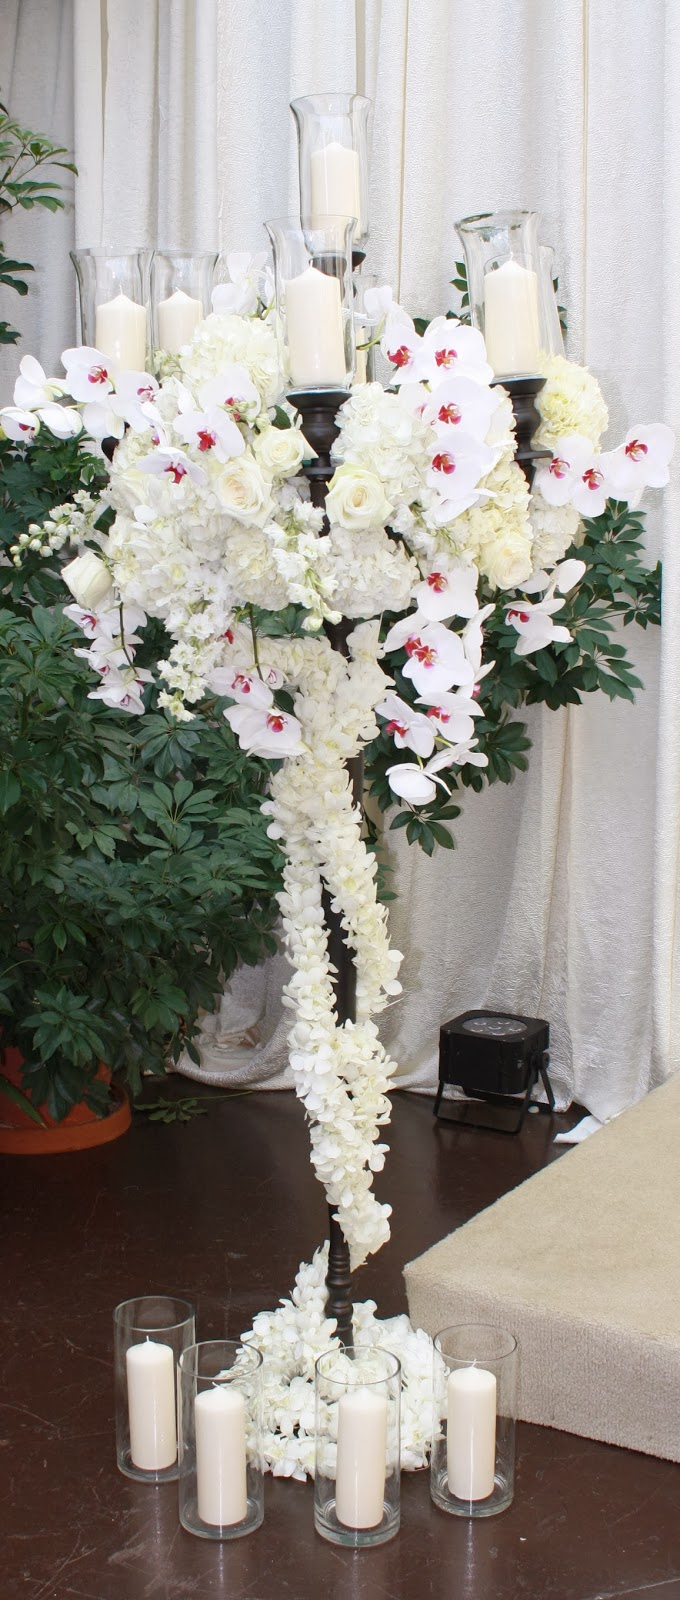 Lauritzen Garden Wedding and Reception - YouTube  Lauritzen Gardens Wedding